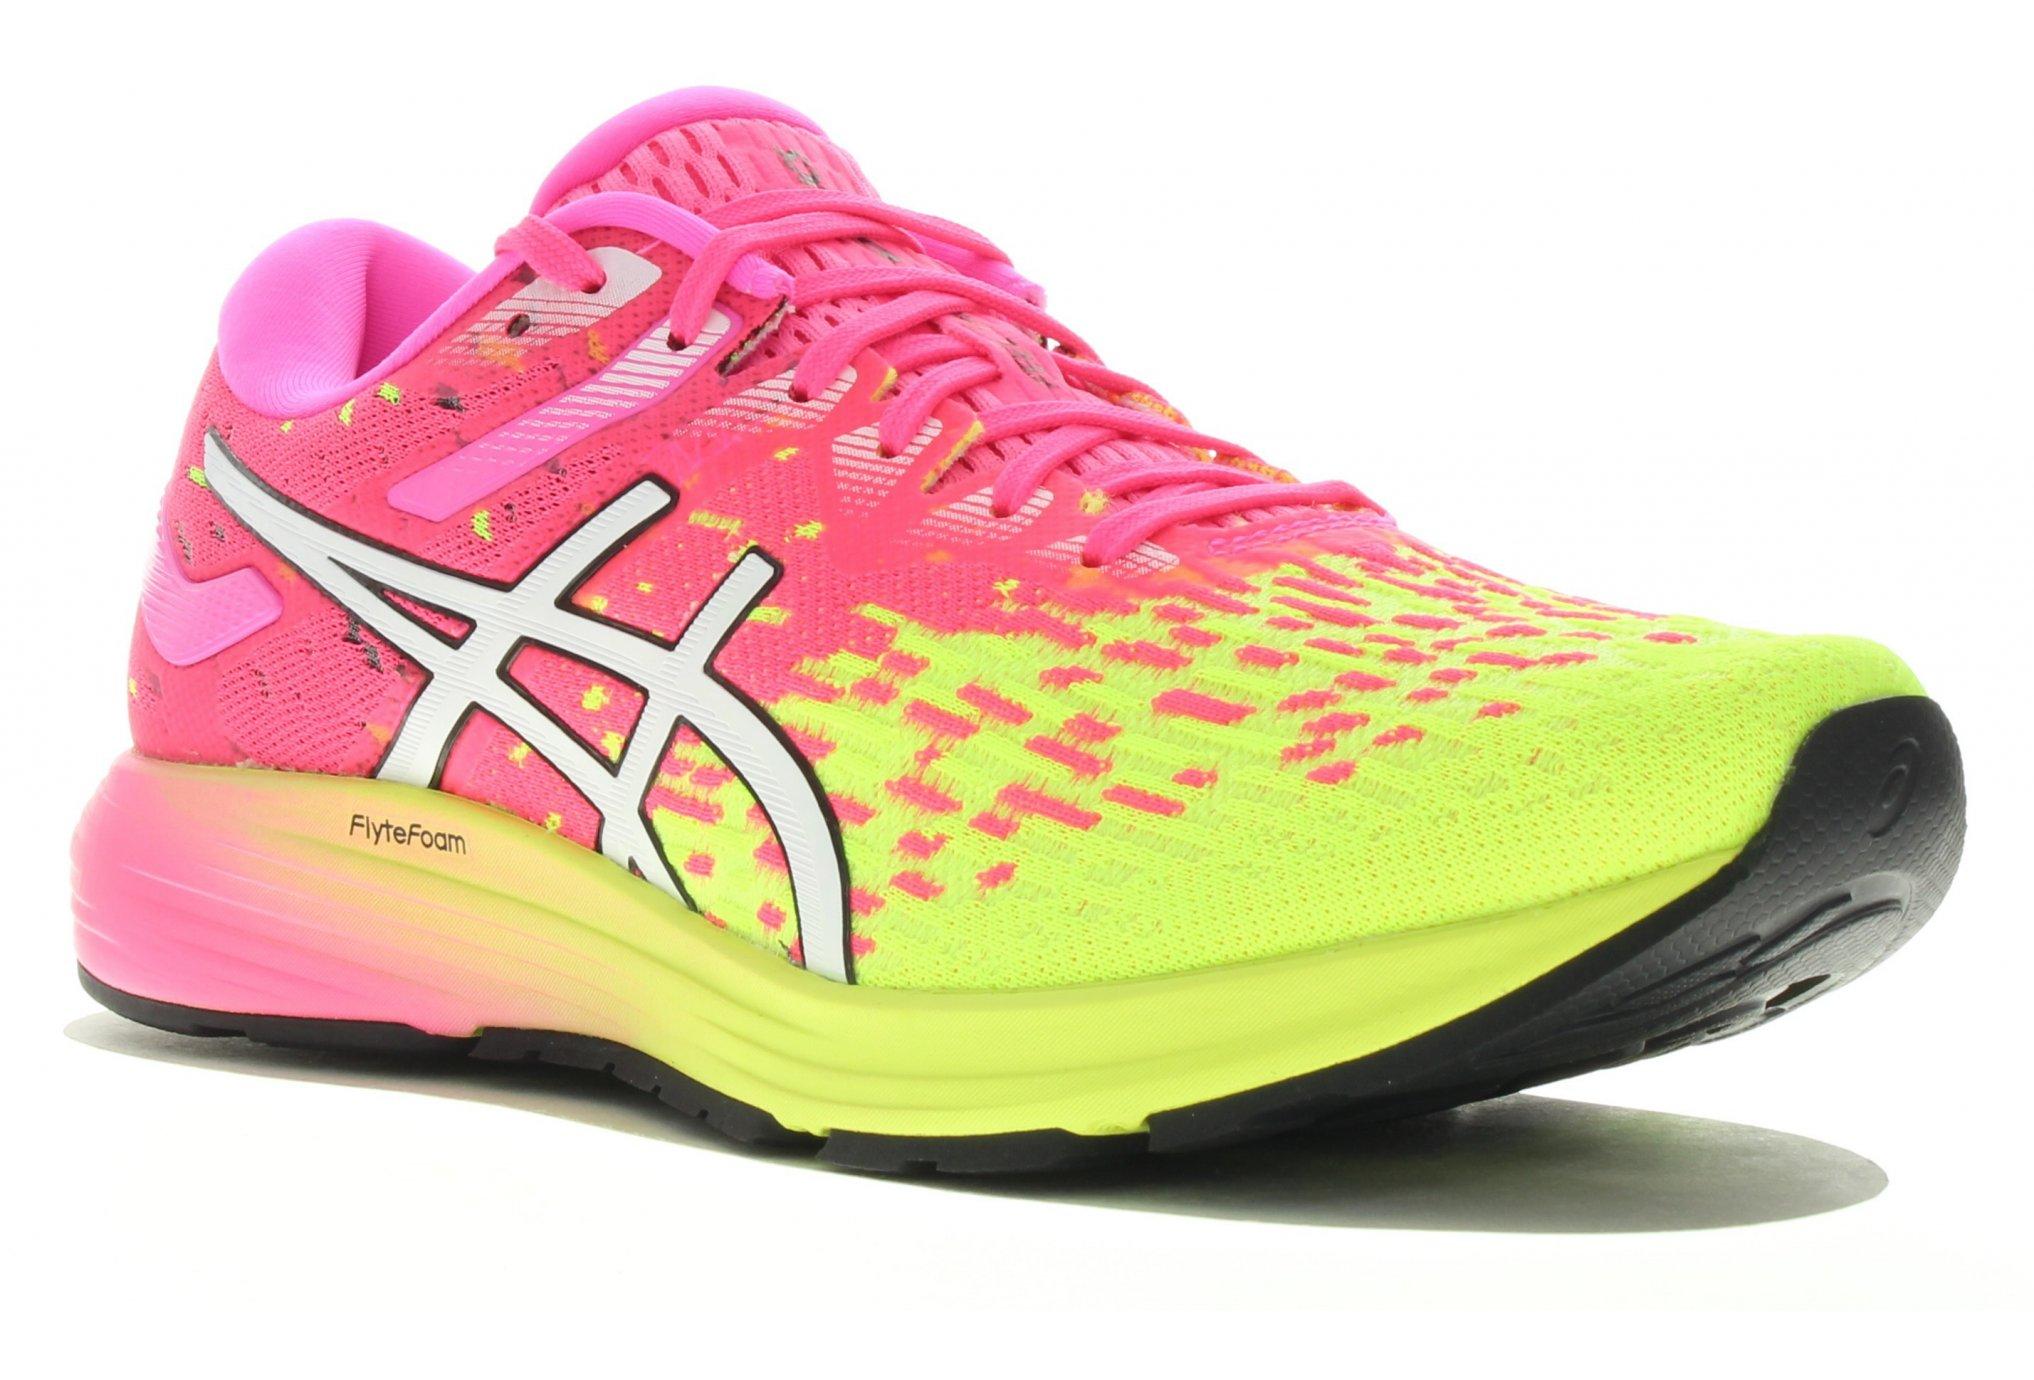 Asics Dynaflyte 4 Chaussures running femme